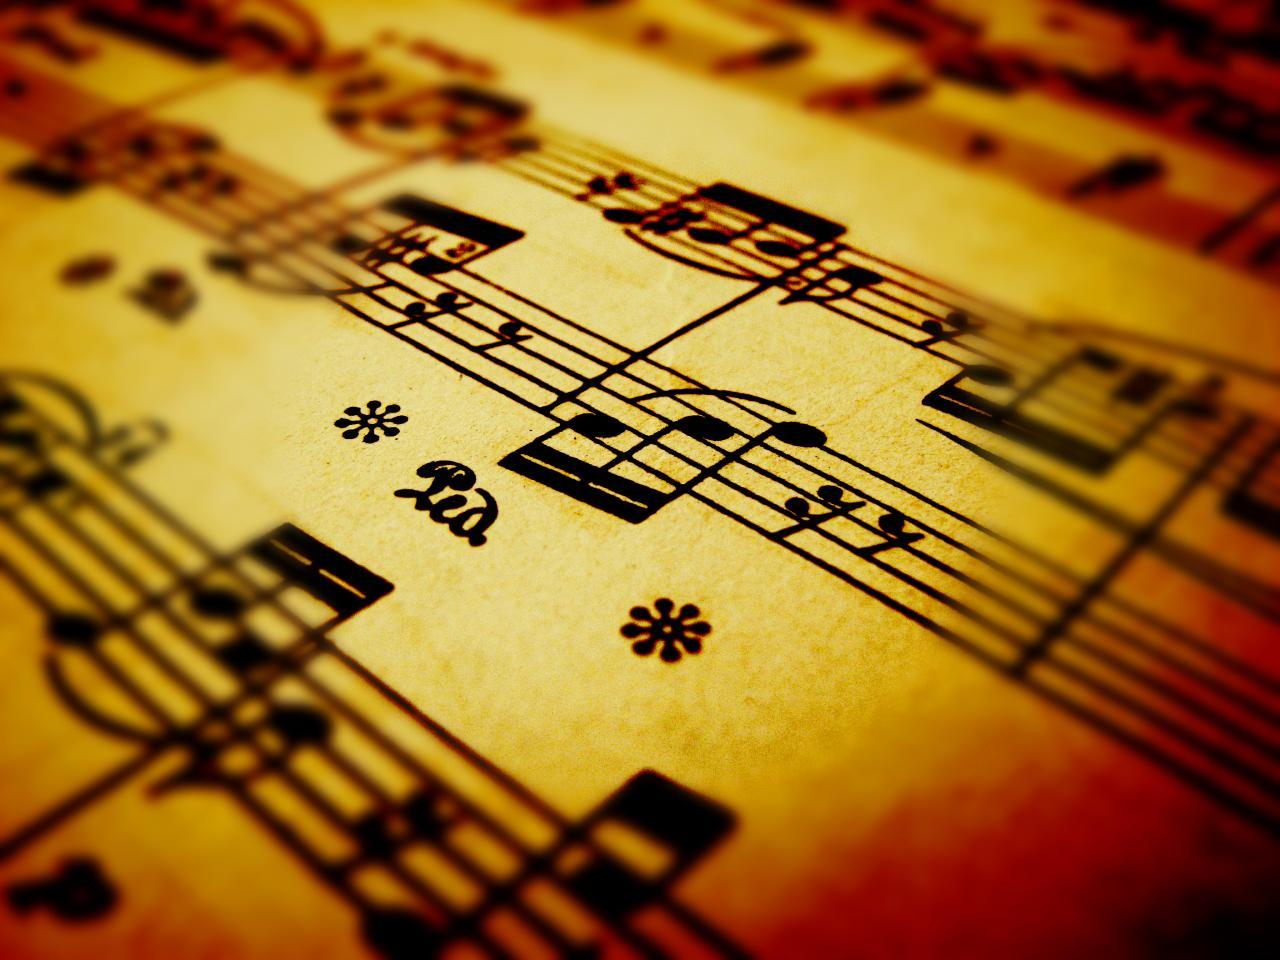 Minecraft Sheet Music (Subwoofer Lullaby Flute/Clarinet/Alto